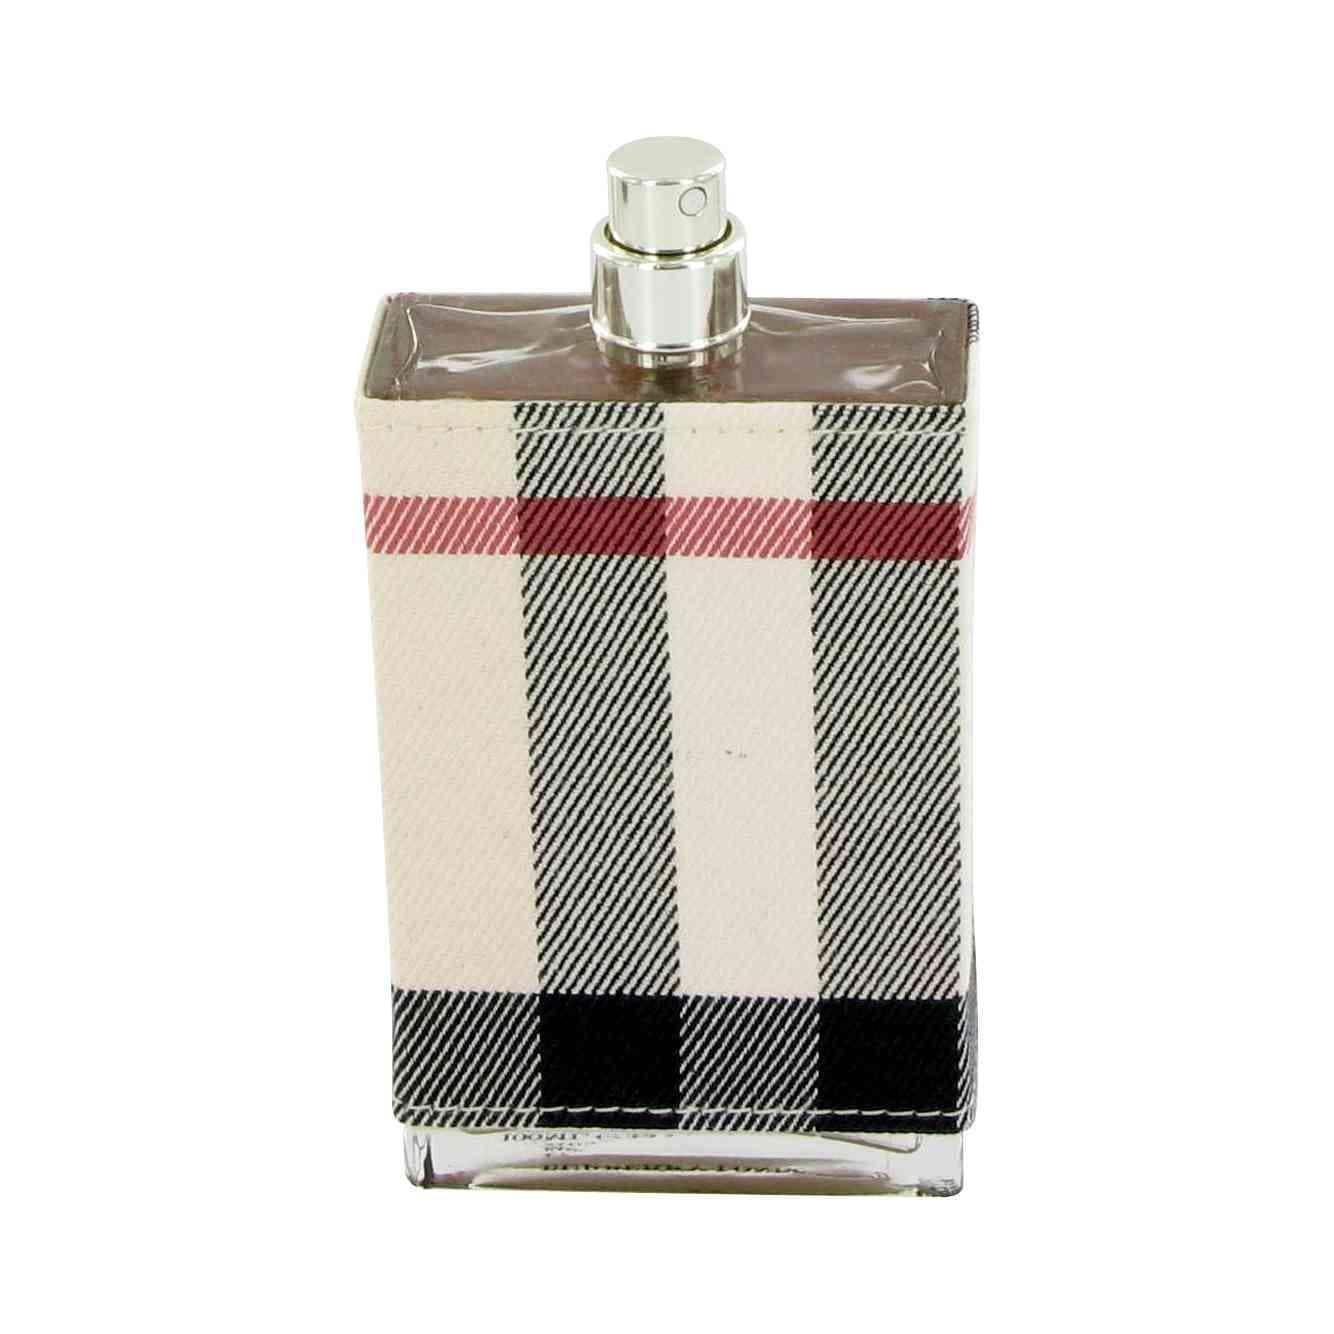 Burberrys 3.3 oz Eau De Parfum Spray for women NEW